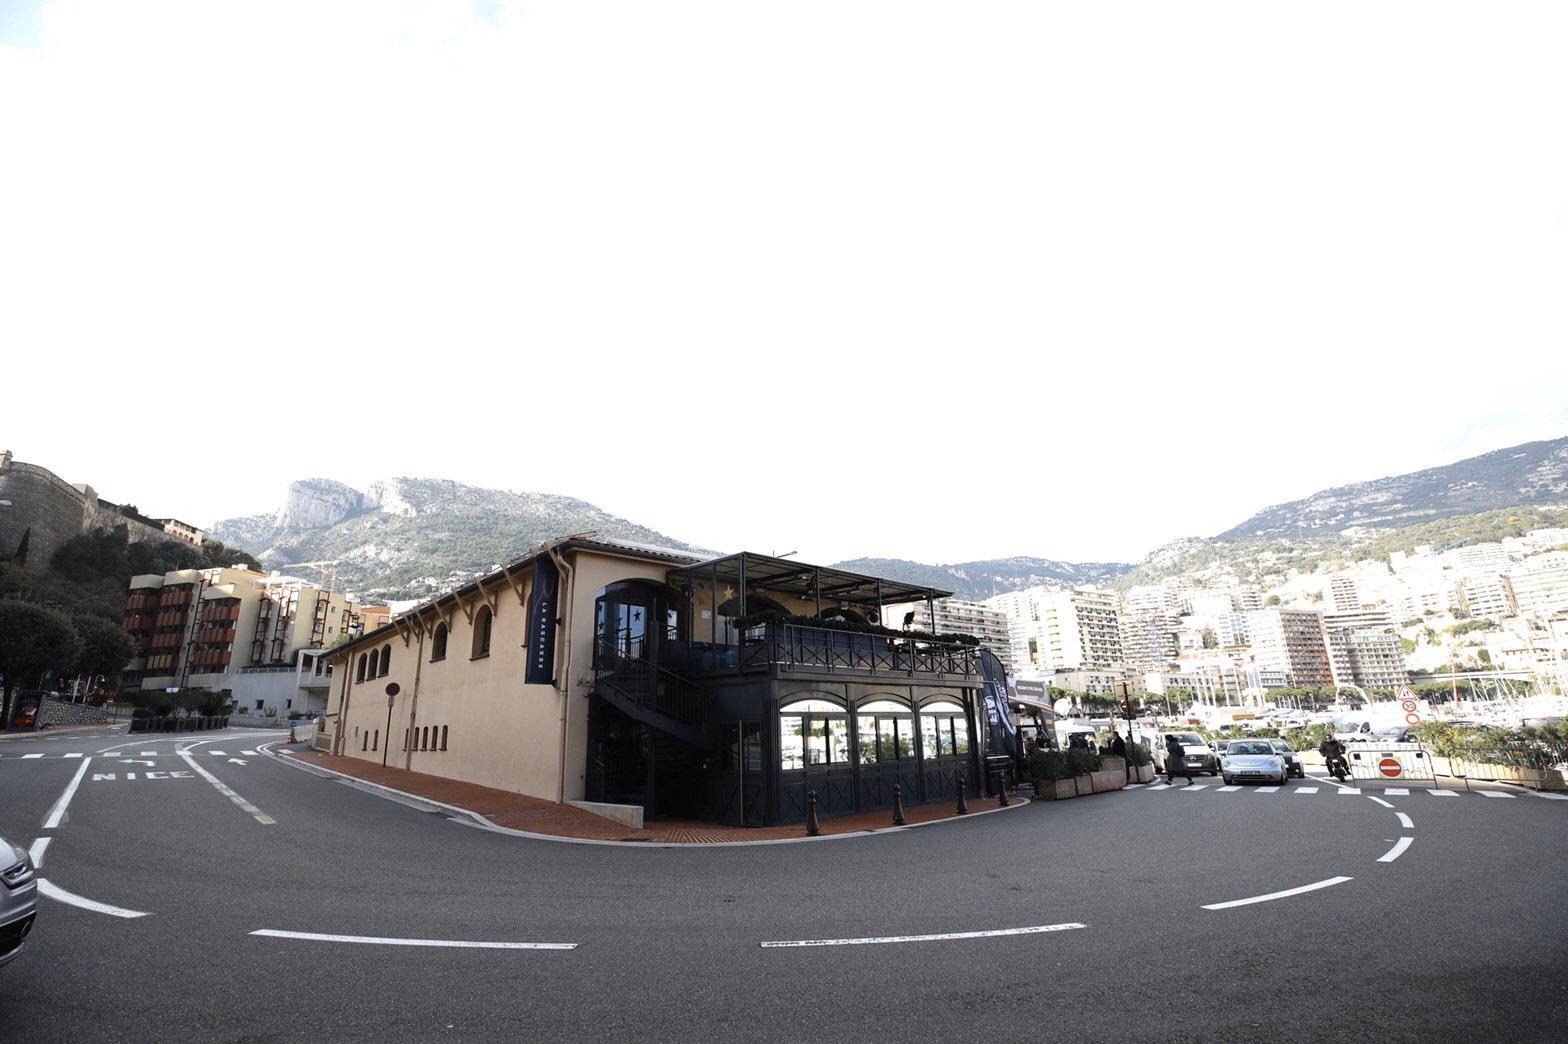 WRC: 88º Rallye Automobile de Monte-Carlo [20-26 de Enero] - Página 6 EPA2QLIUUAEBgYD?format=jpg&name=large